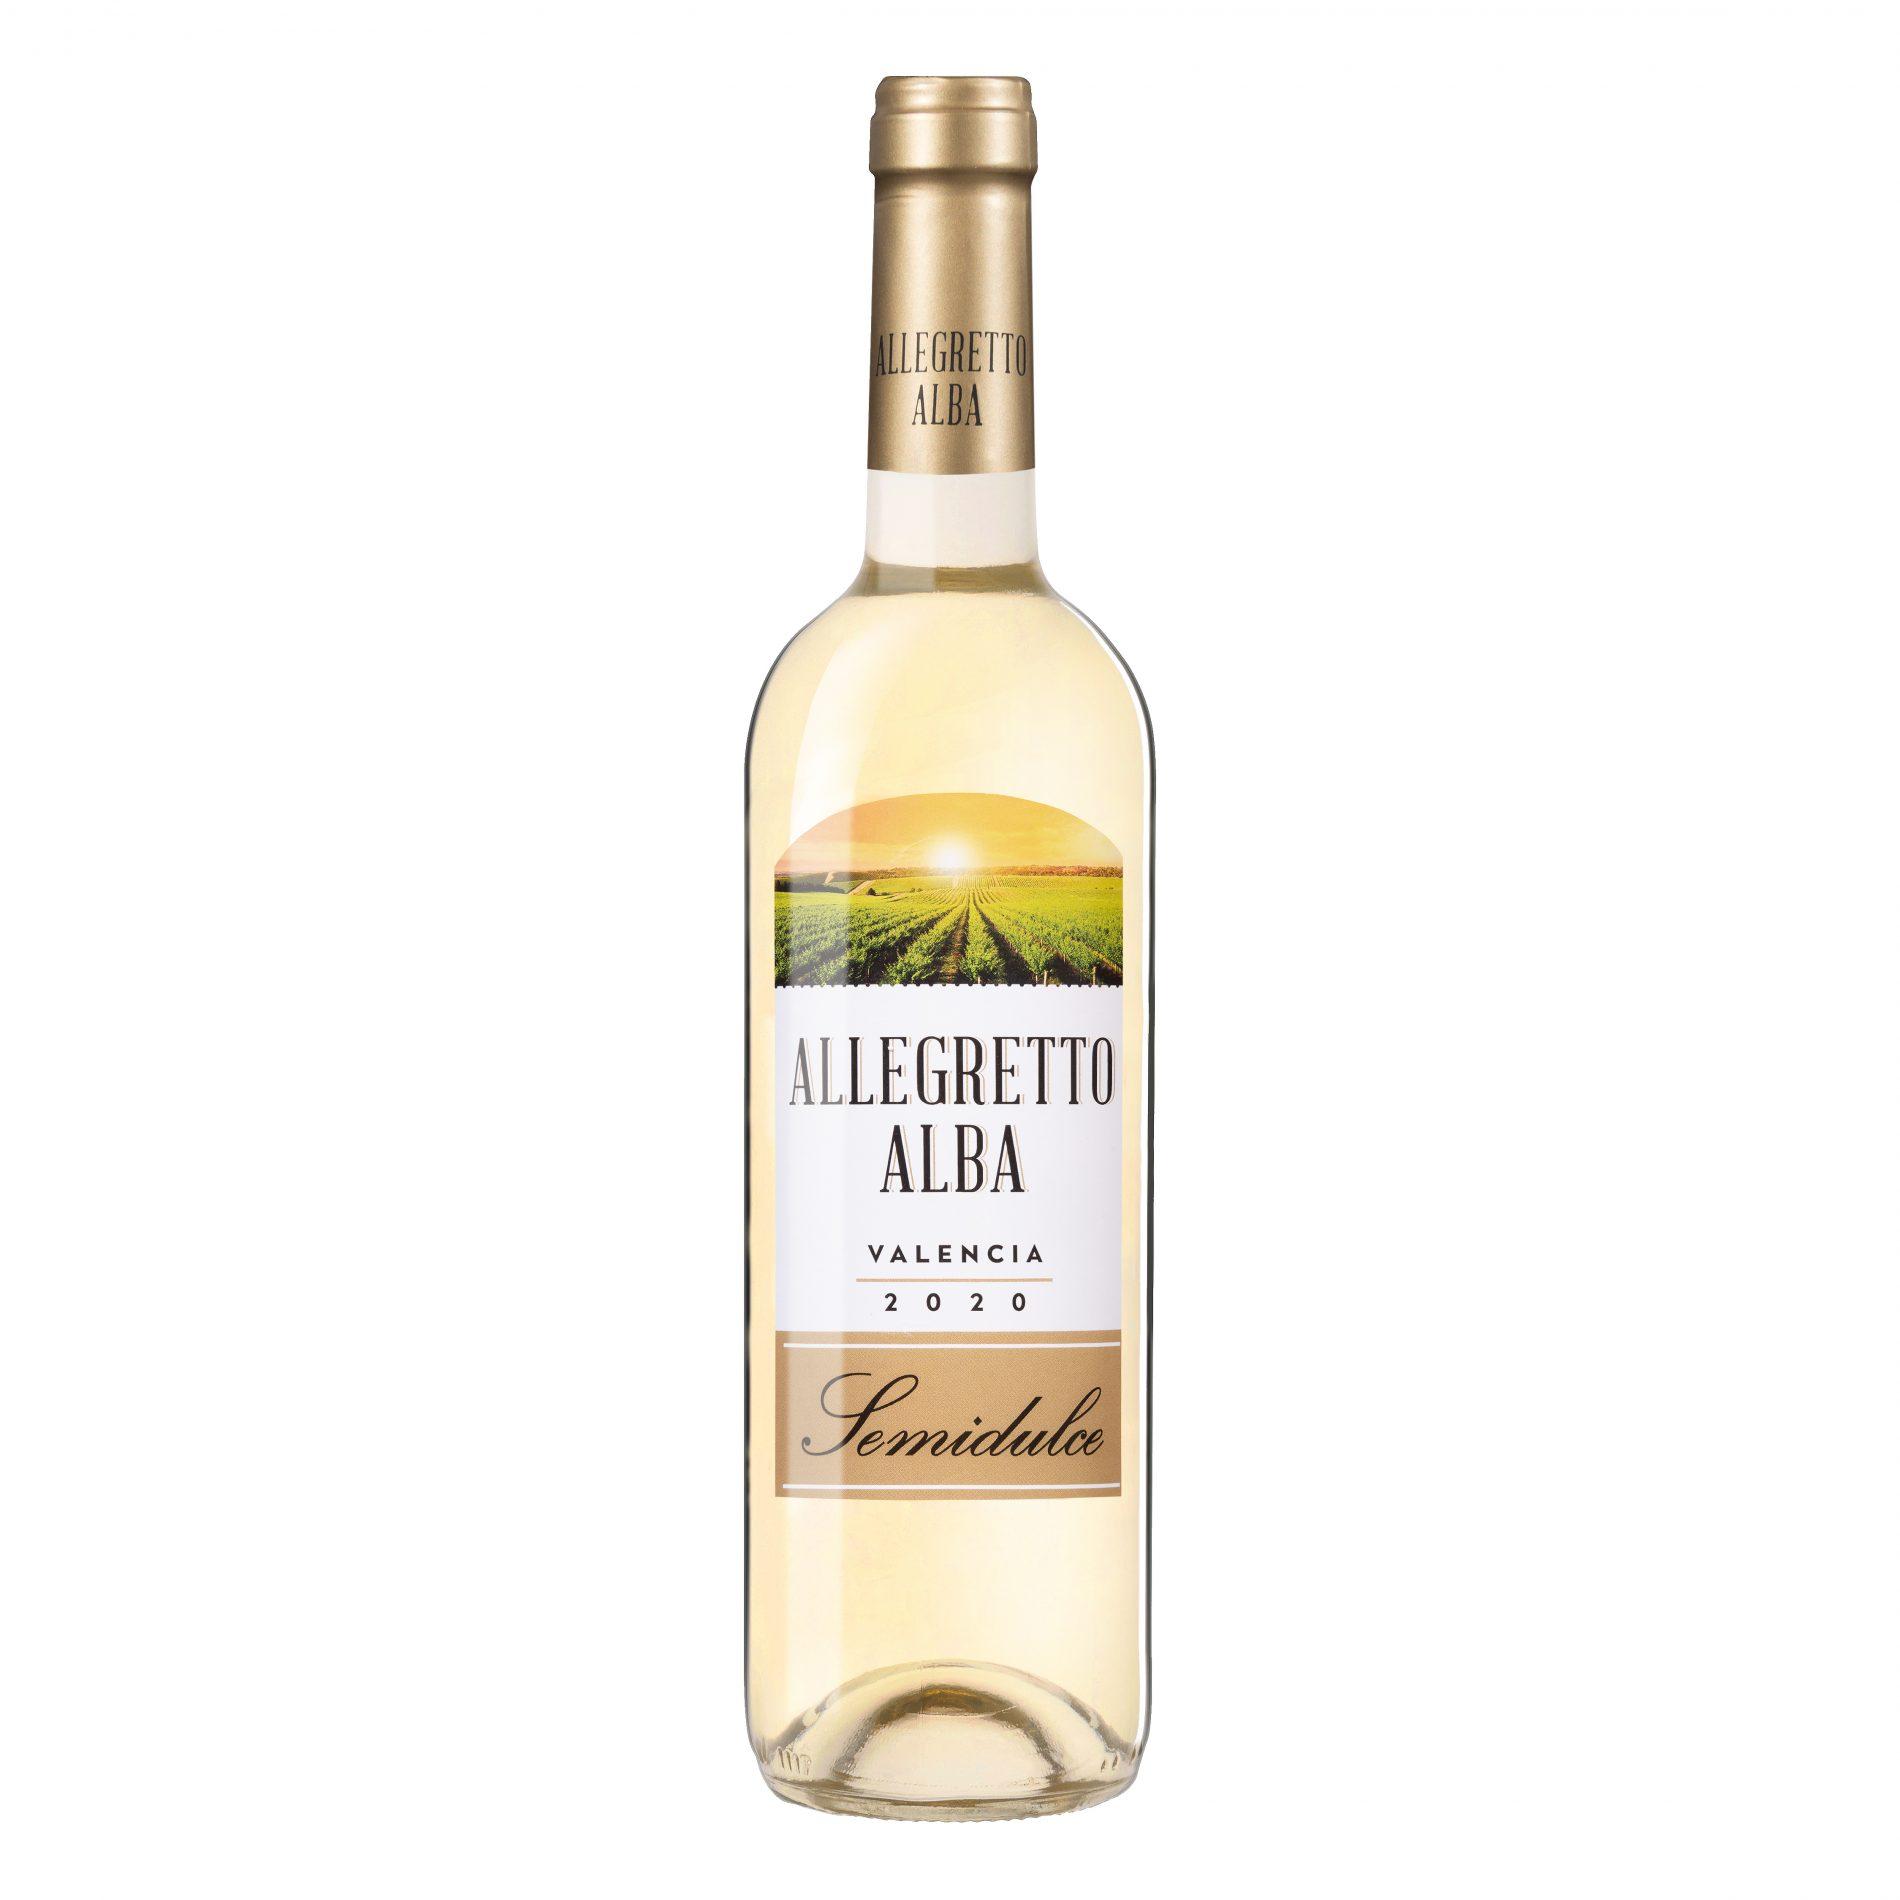 Fotografía Producto, Vino Blanco Allegretto Alba.